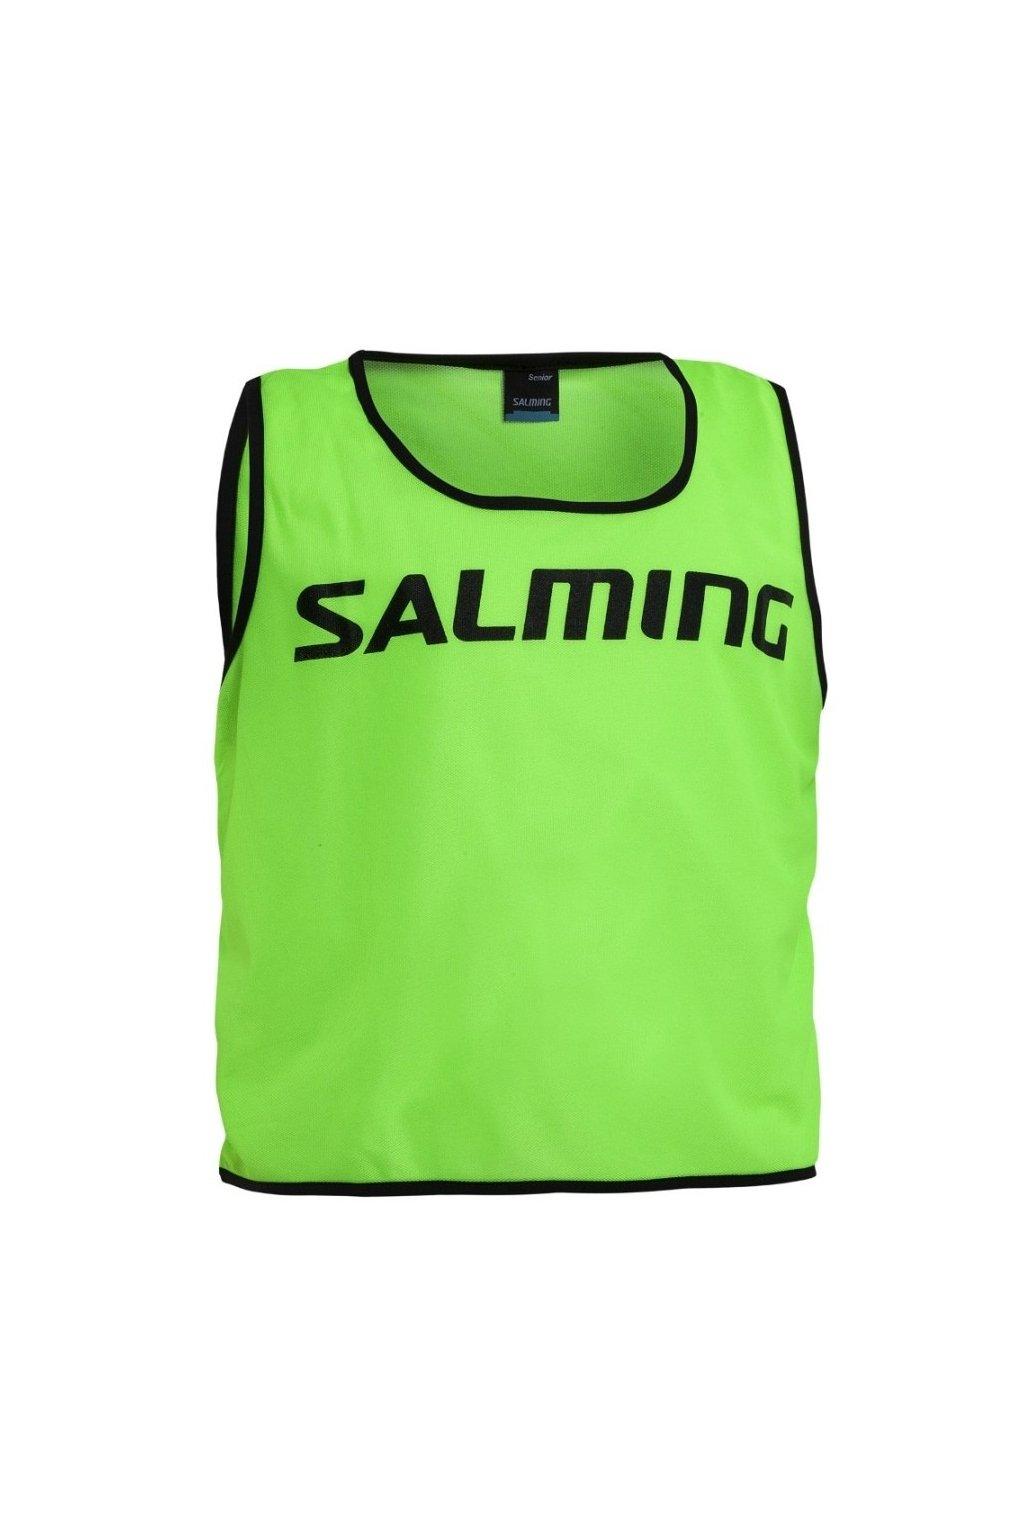 salming training vest (3)